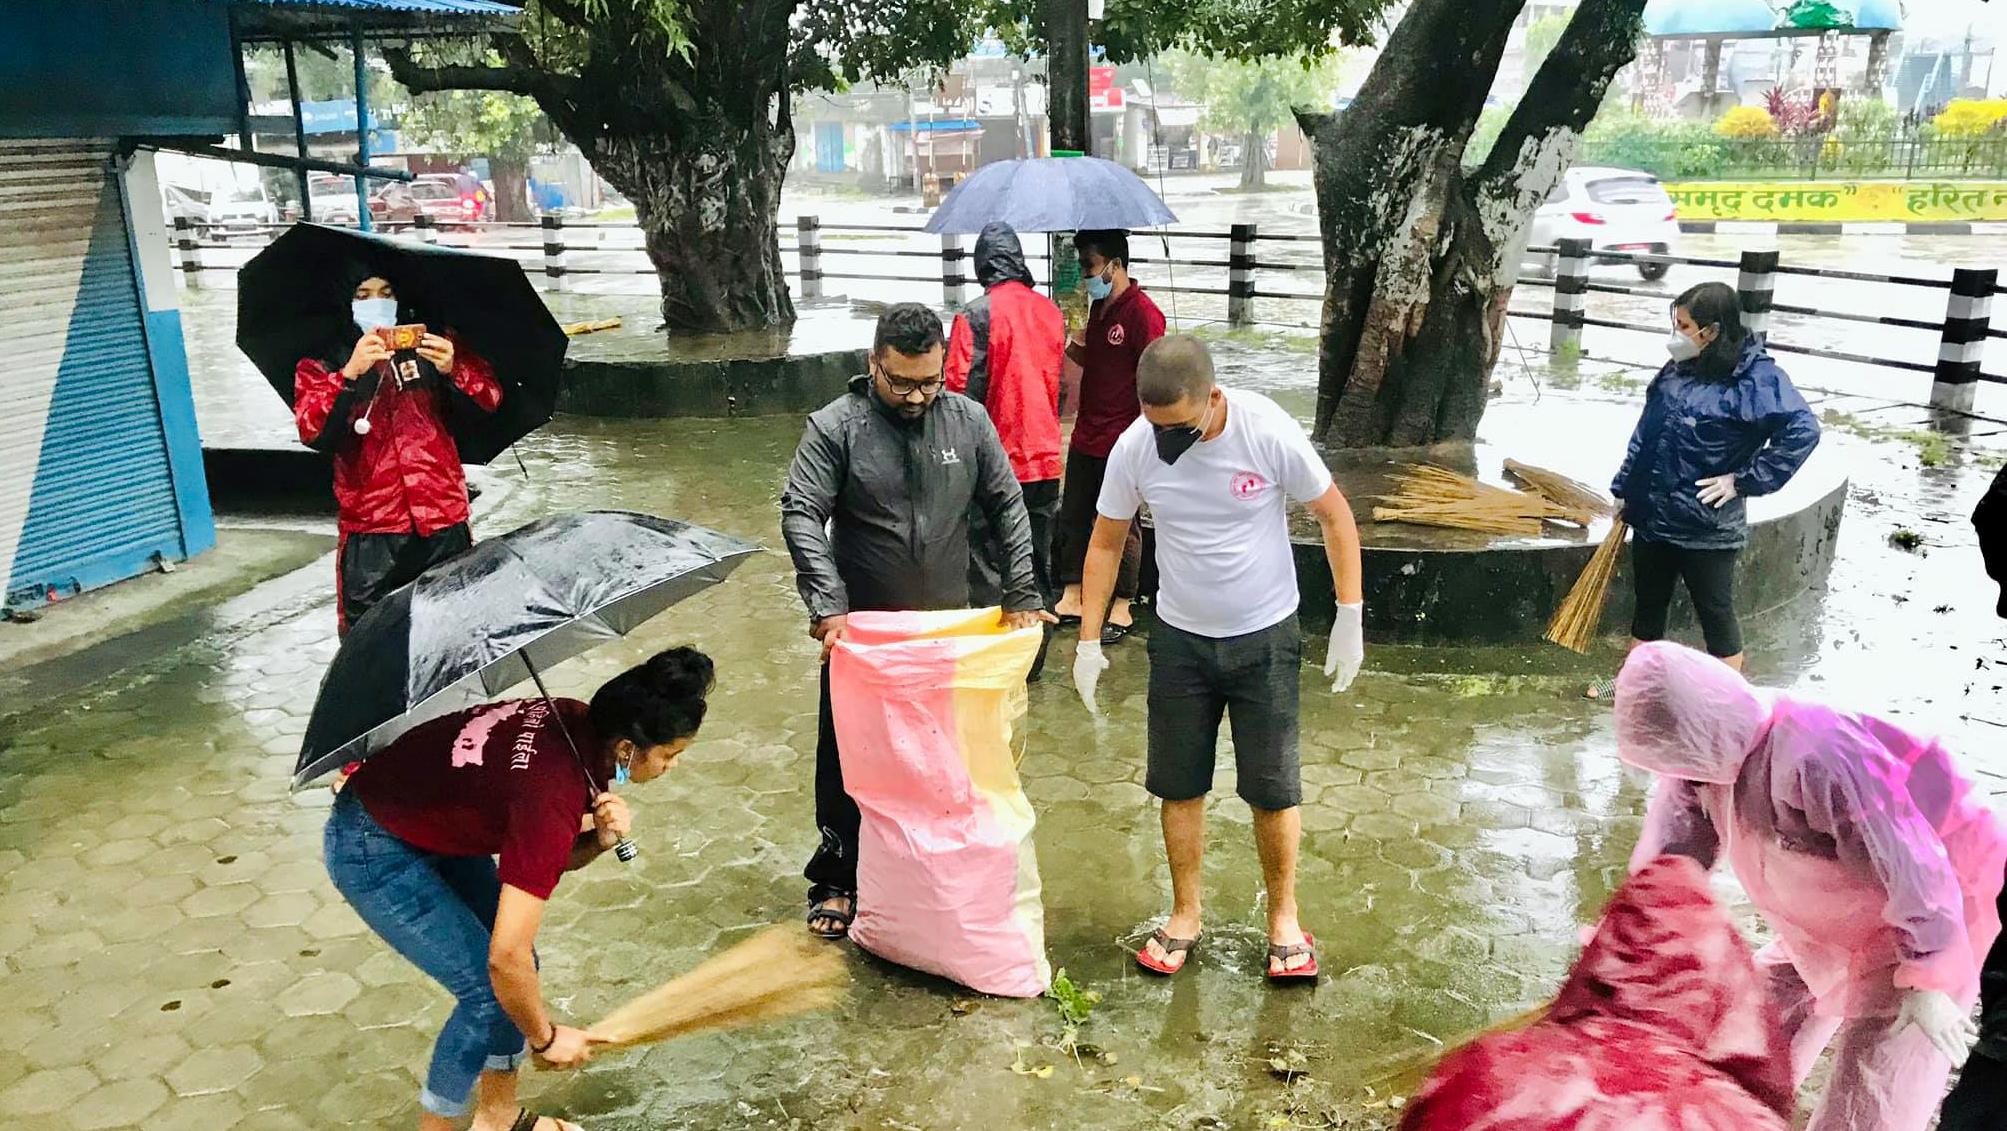 'पहिलाे पाइला नेपाल' दमक शाखाकाे ८ हप्ते सरसफाई अभियान सुरू